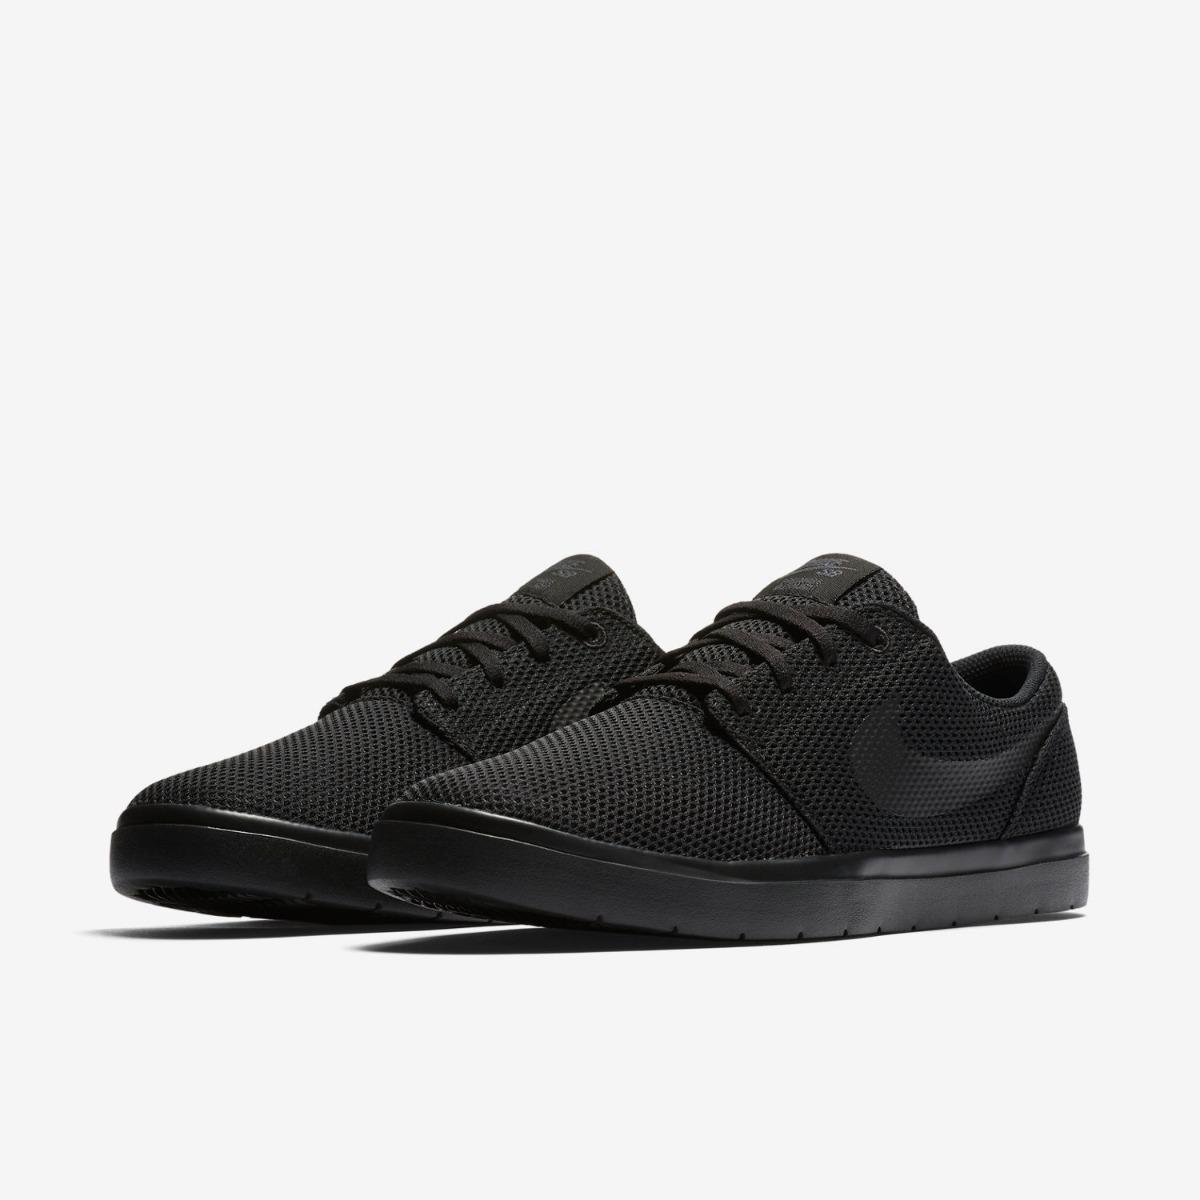 factory authentic a03fe 5b92b zapatillas nike sb portmore ultralight 2 black suela negra ...